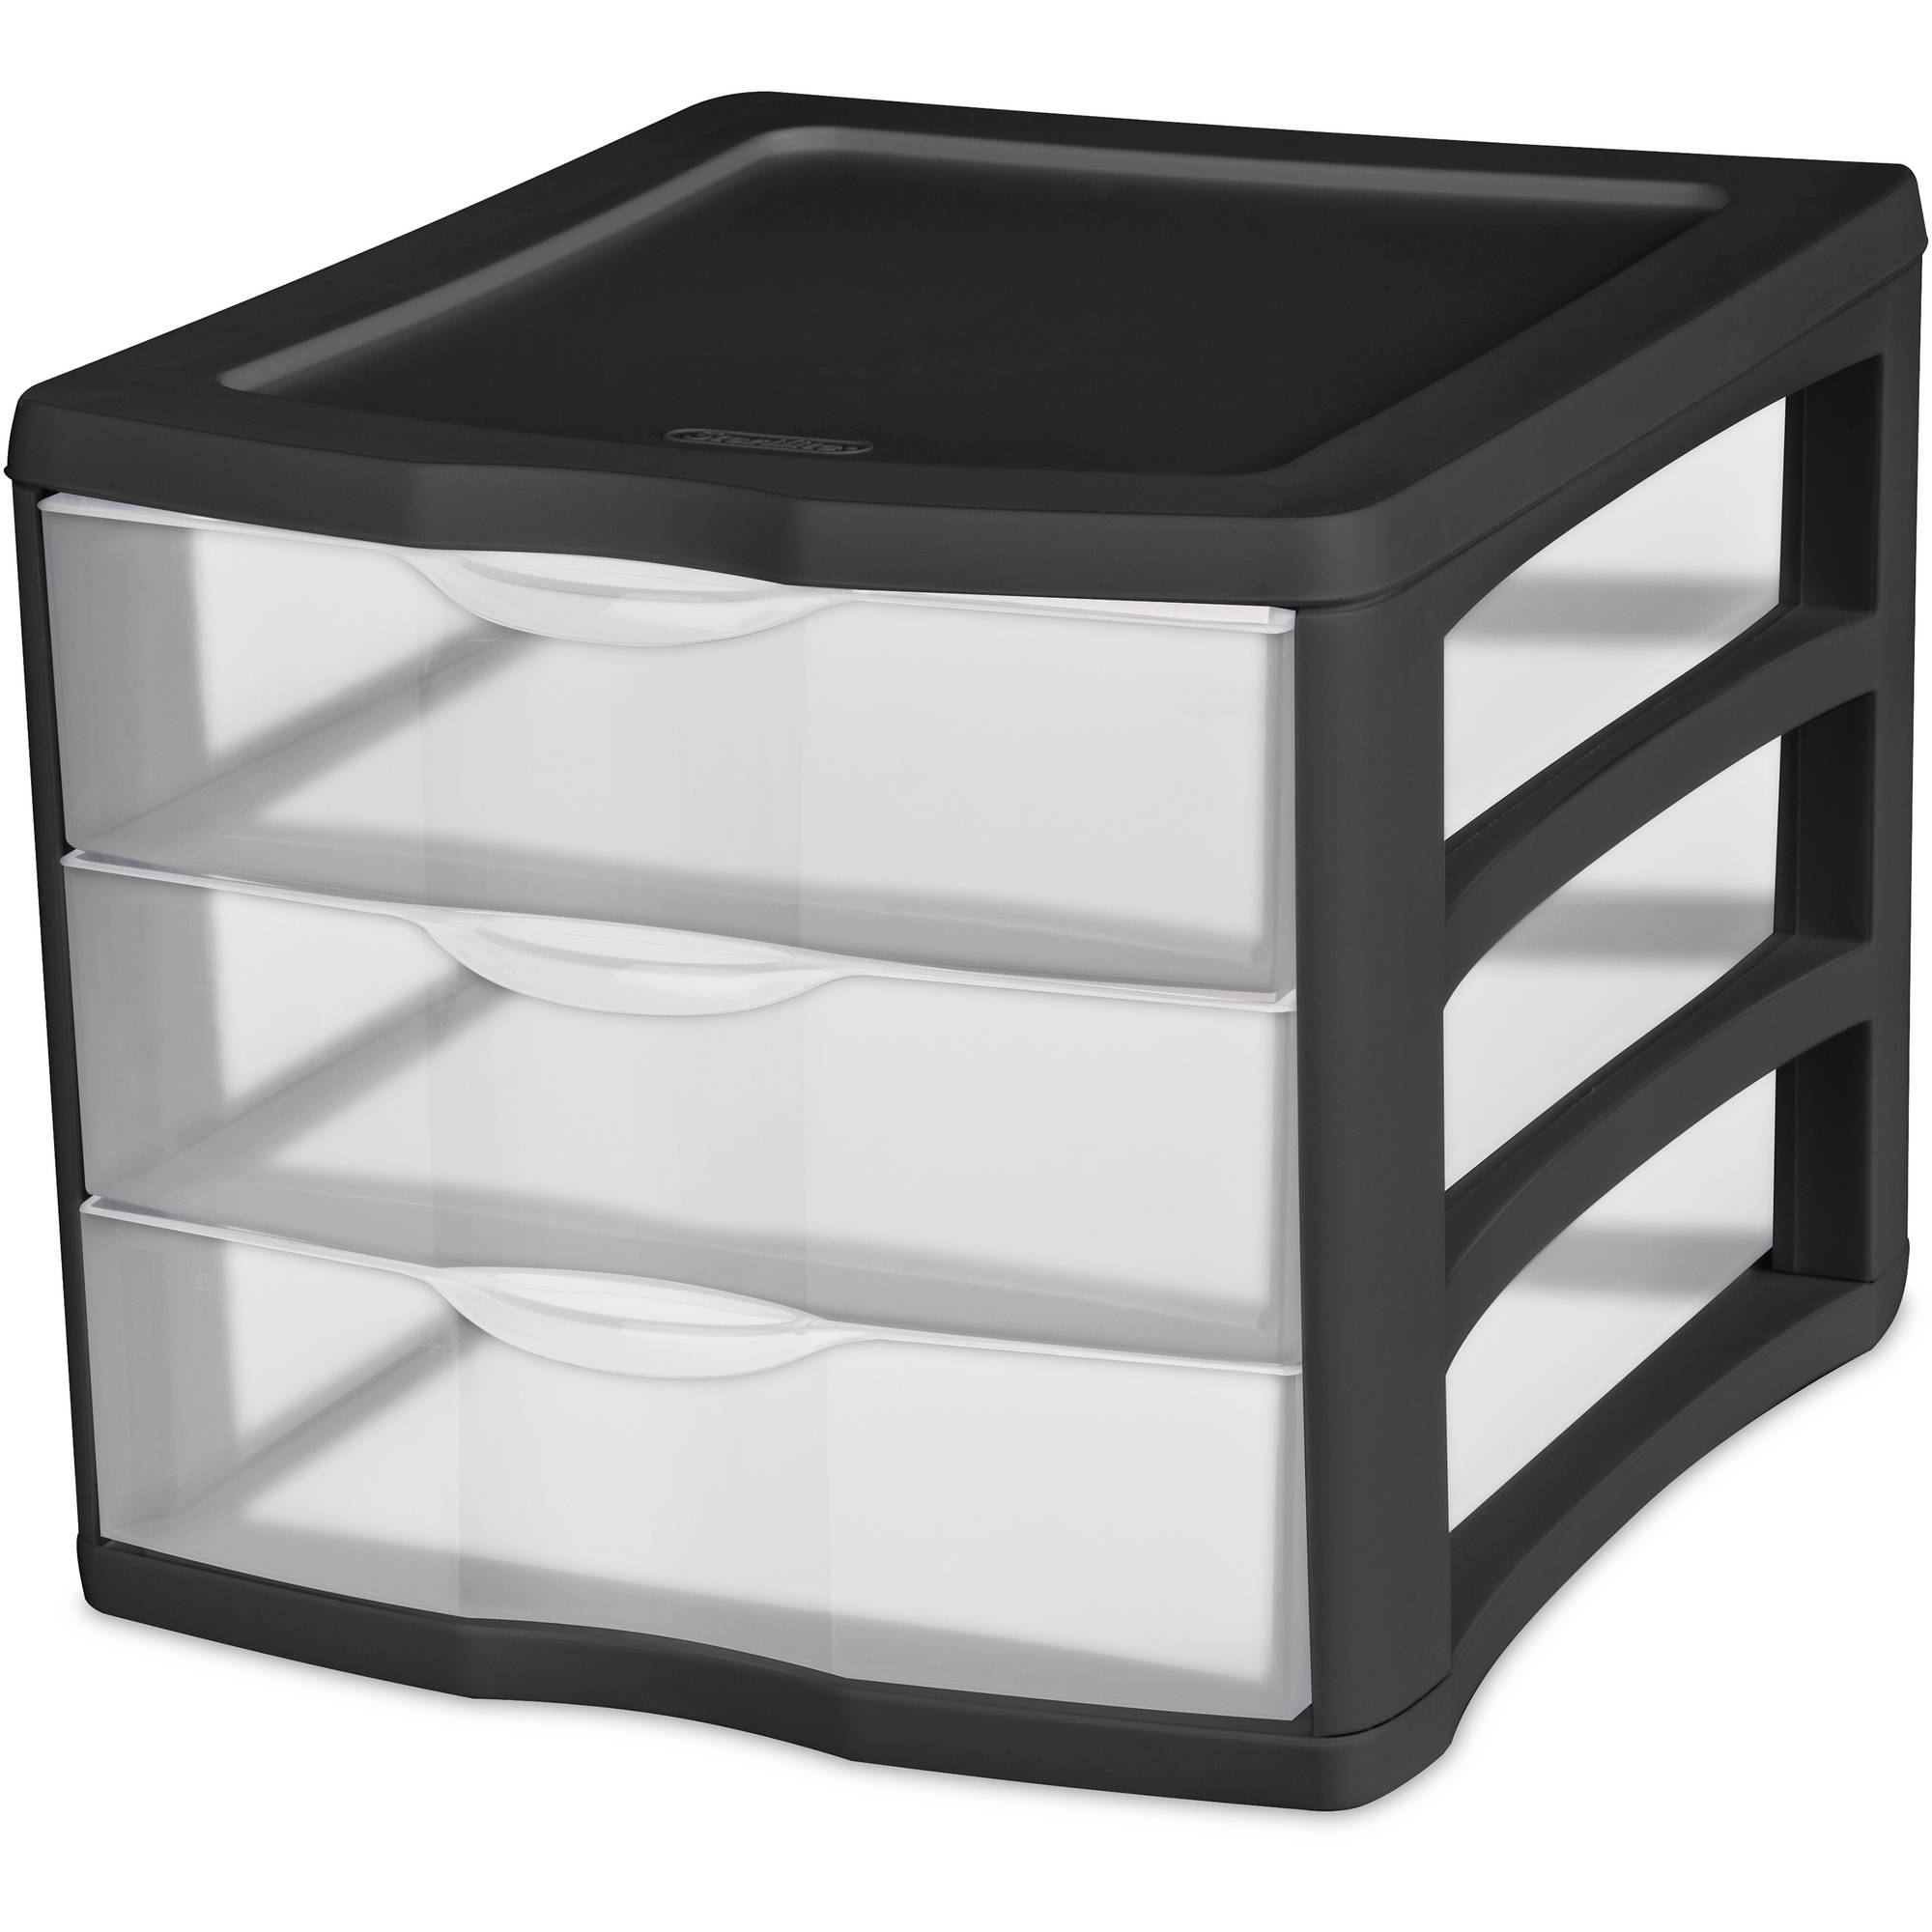 Sterilite 3 Drawer Desktop Unit- Black (Available in Case of 4 or Single Unit)